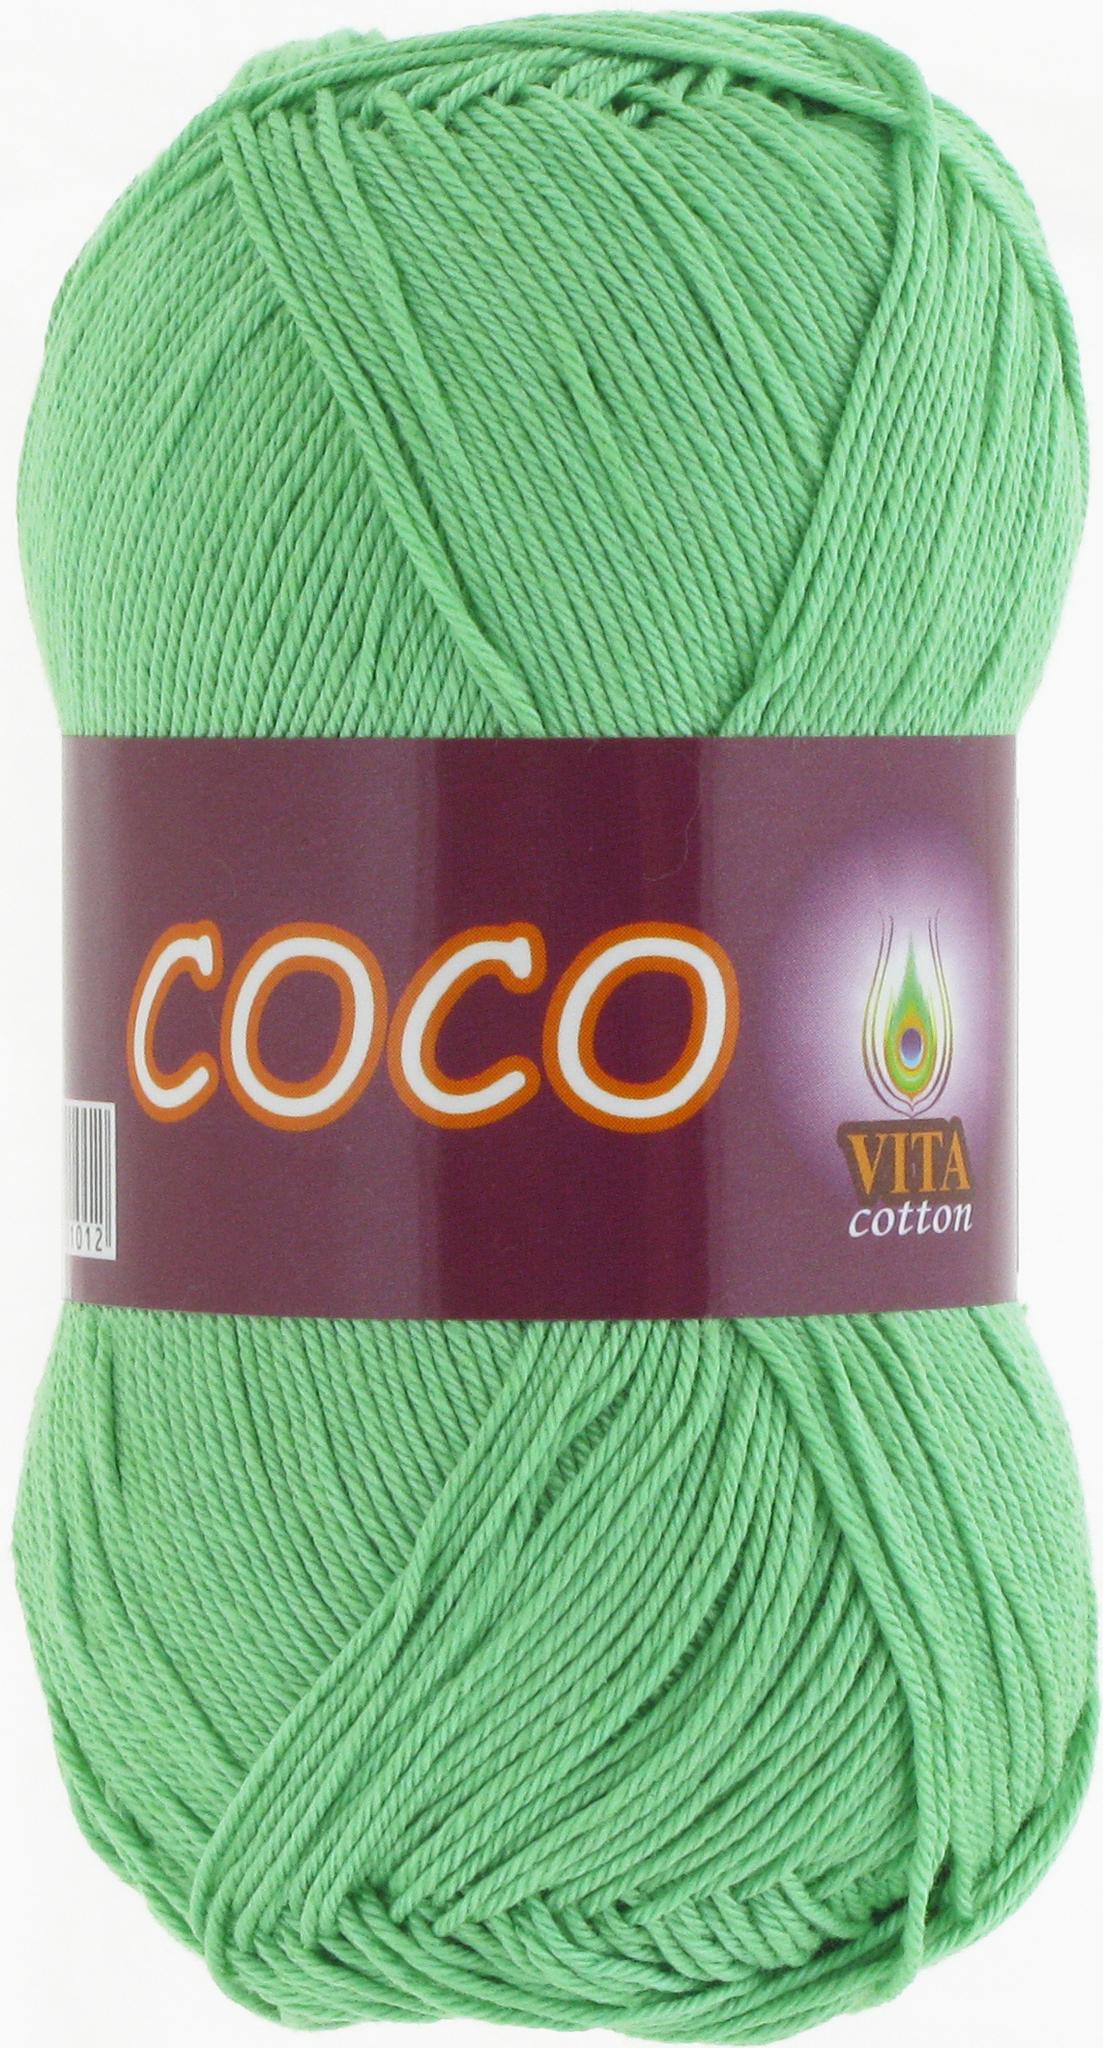 Пряжа Vita Coco 4324 ментол